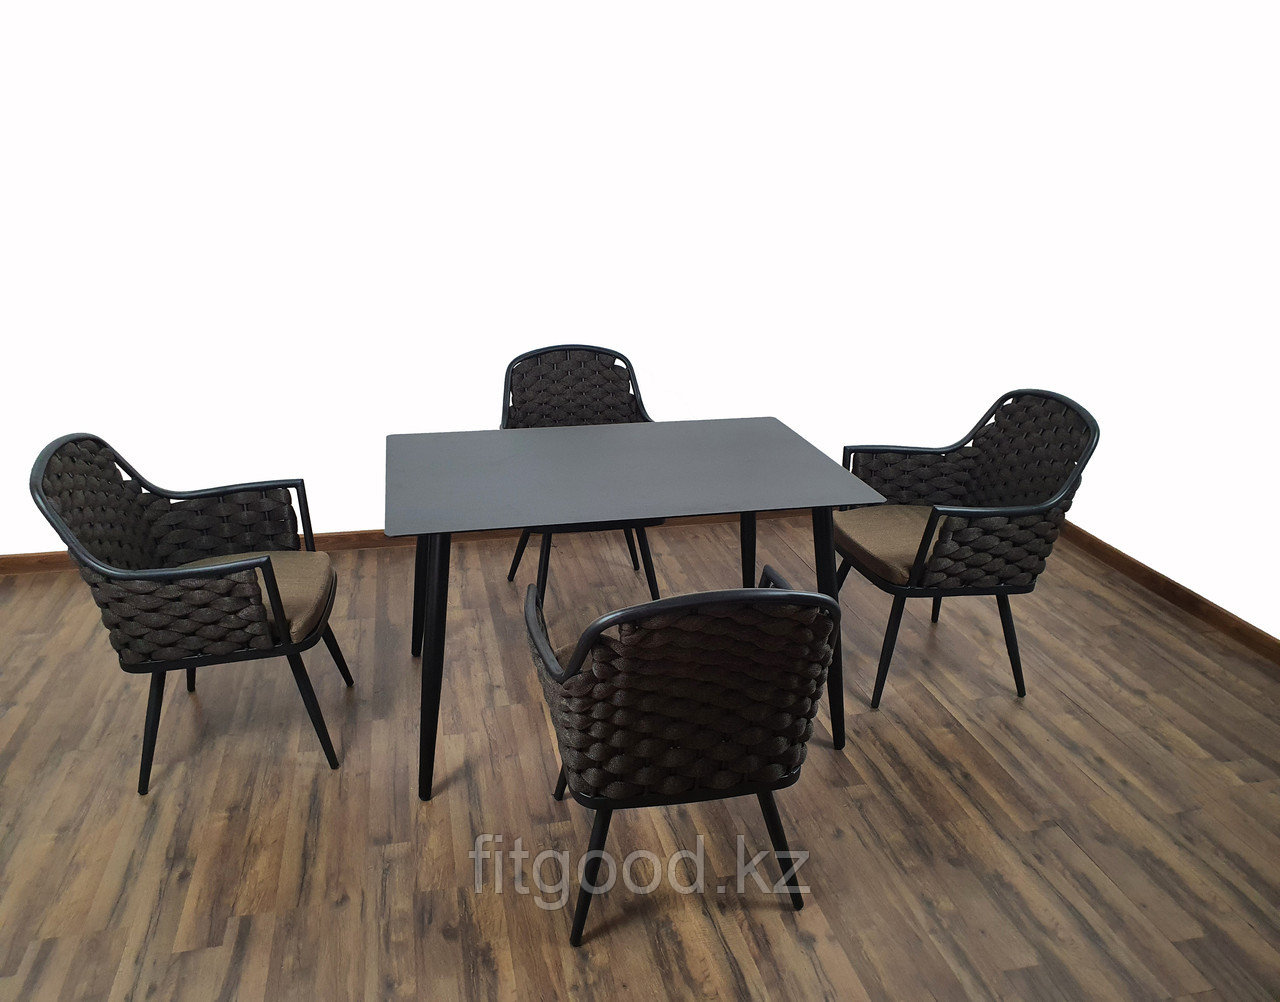 "Комплект мебели обеденный ""Копенгаген"" (4 кресла +стол)"